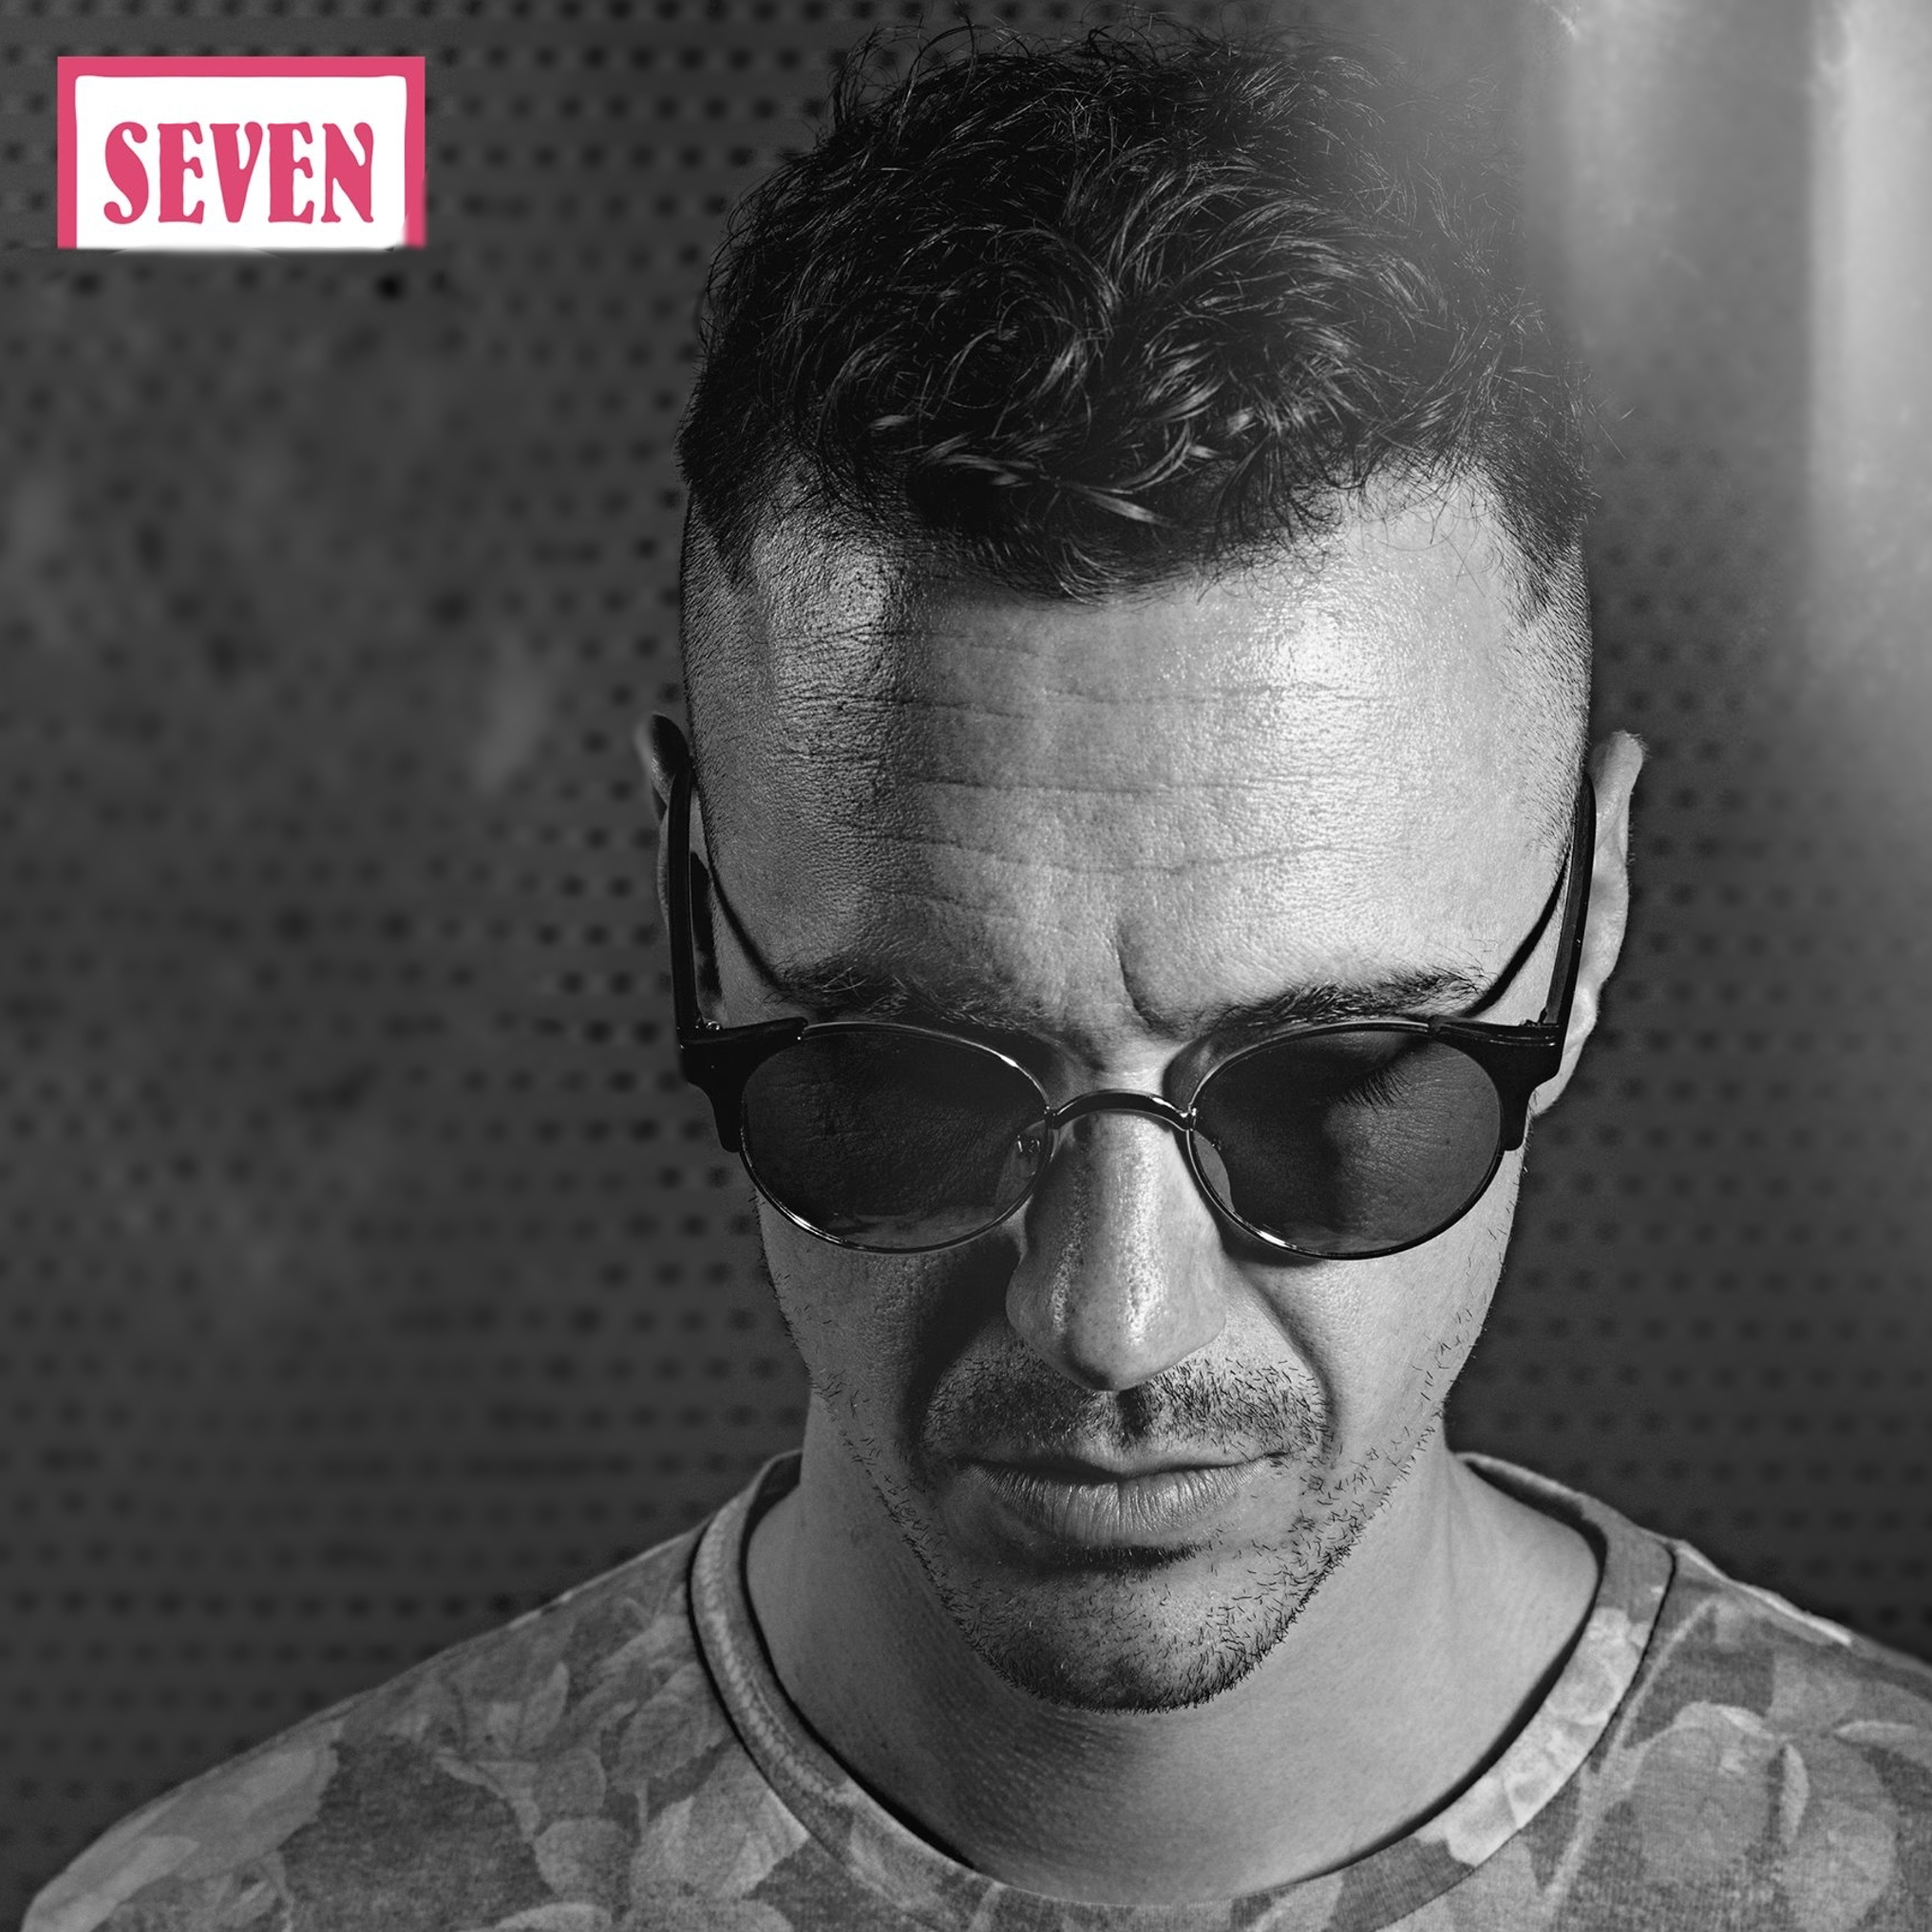 Seven - Soul Artist